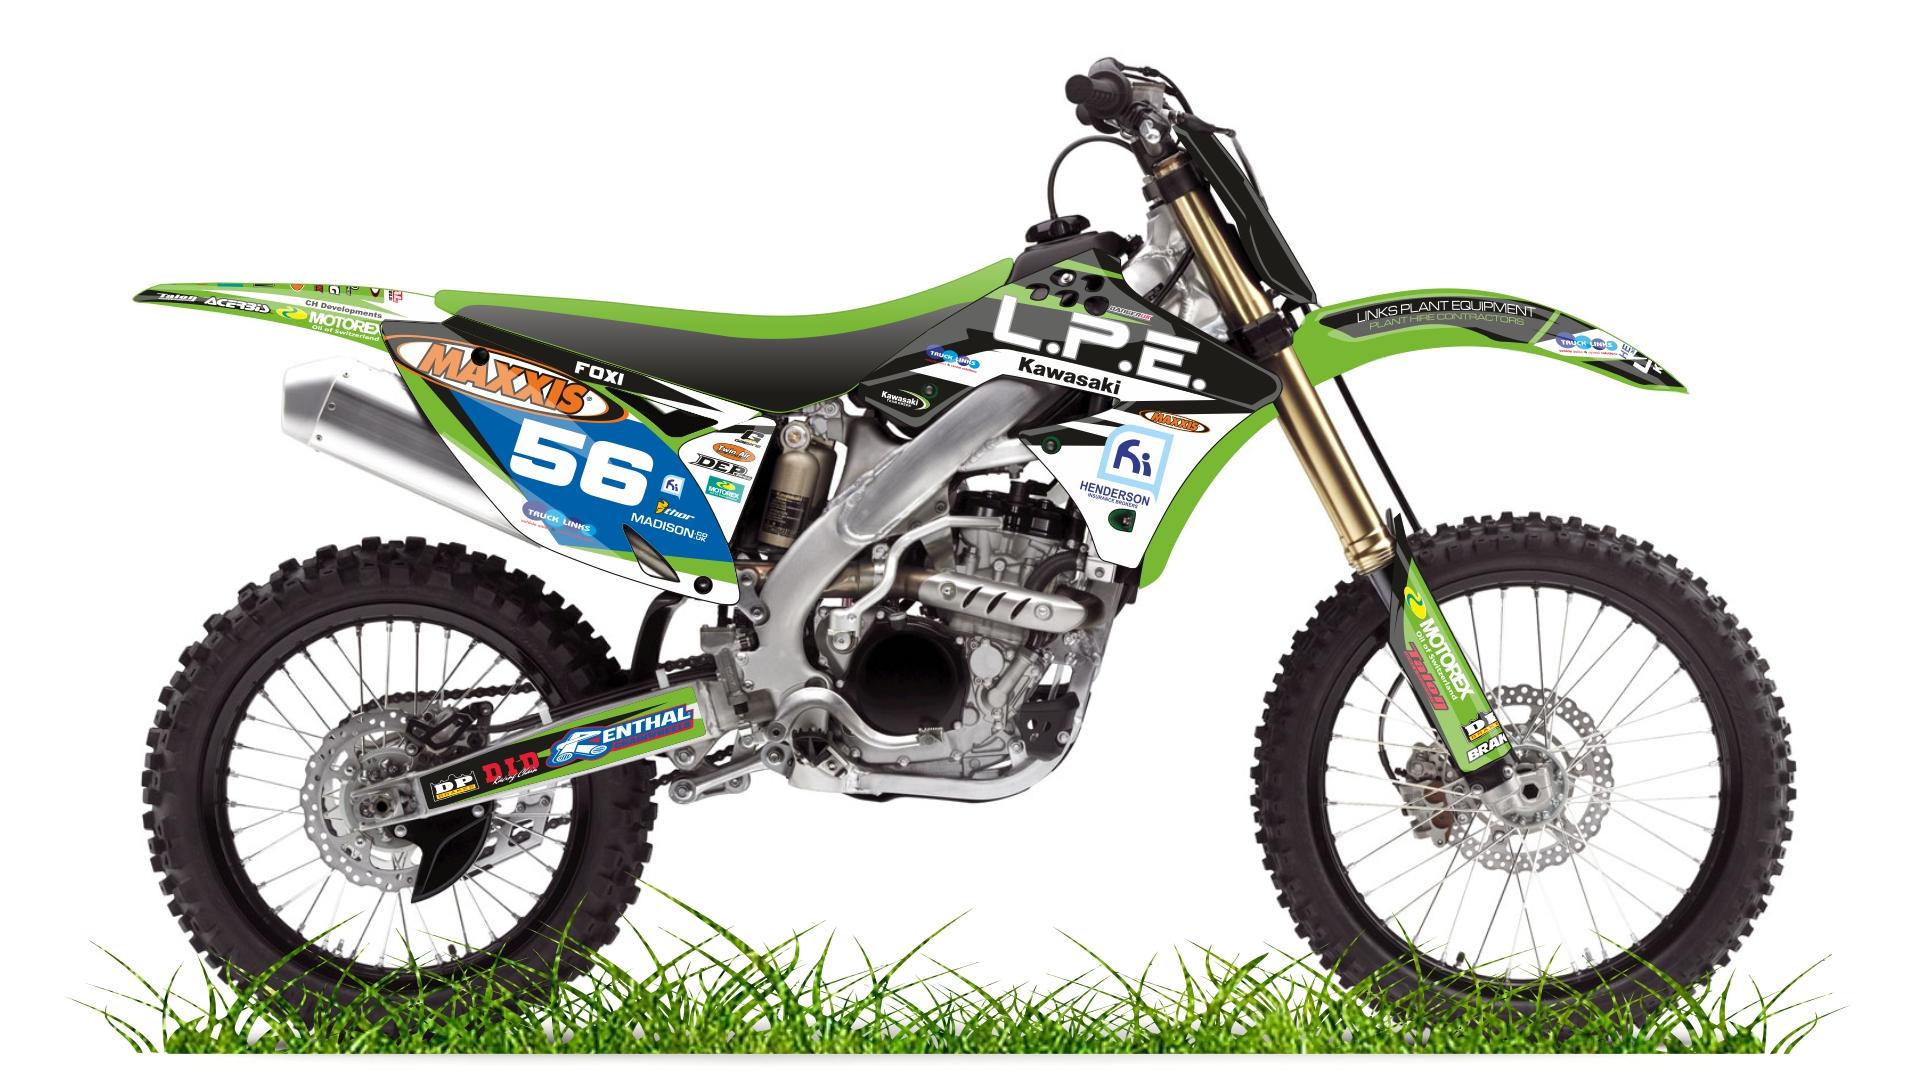 Custom bike KX lpe